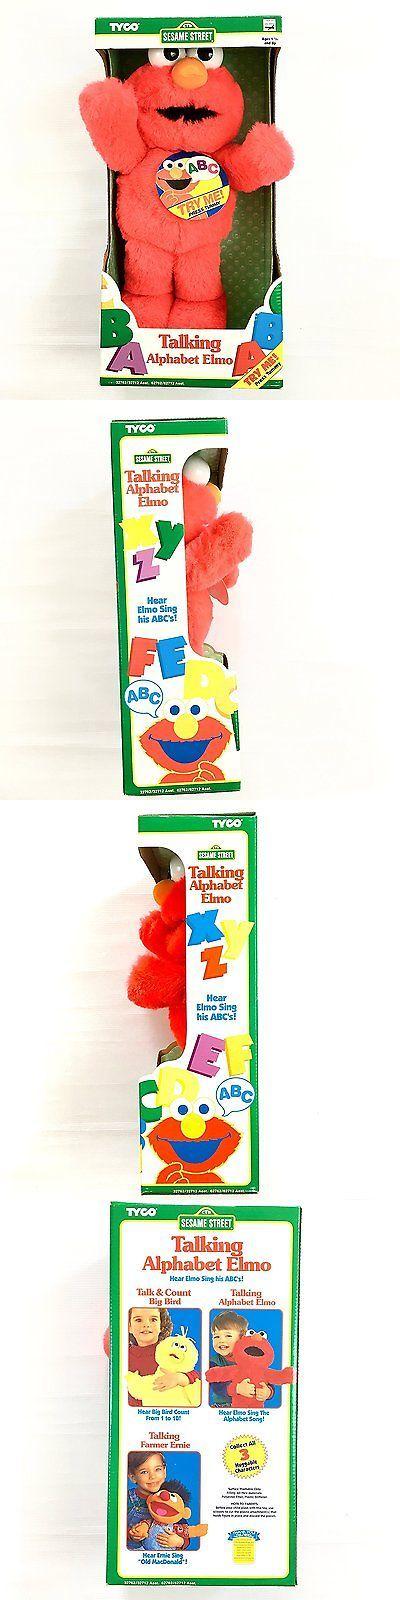 Muppets Sesame Street 2627: 15 Talking Elmo Loves You Plush - Vintage Tyco 1997 -> BUY IT NOW ONLY: $117.16 on eBay!